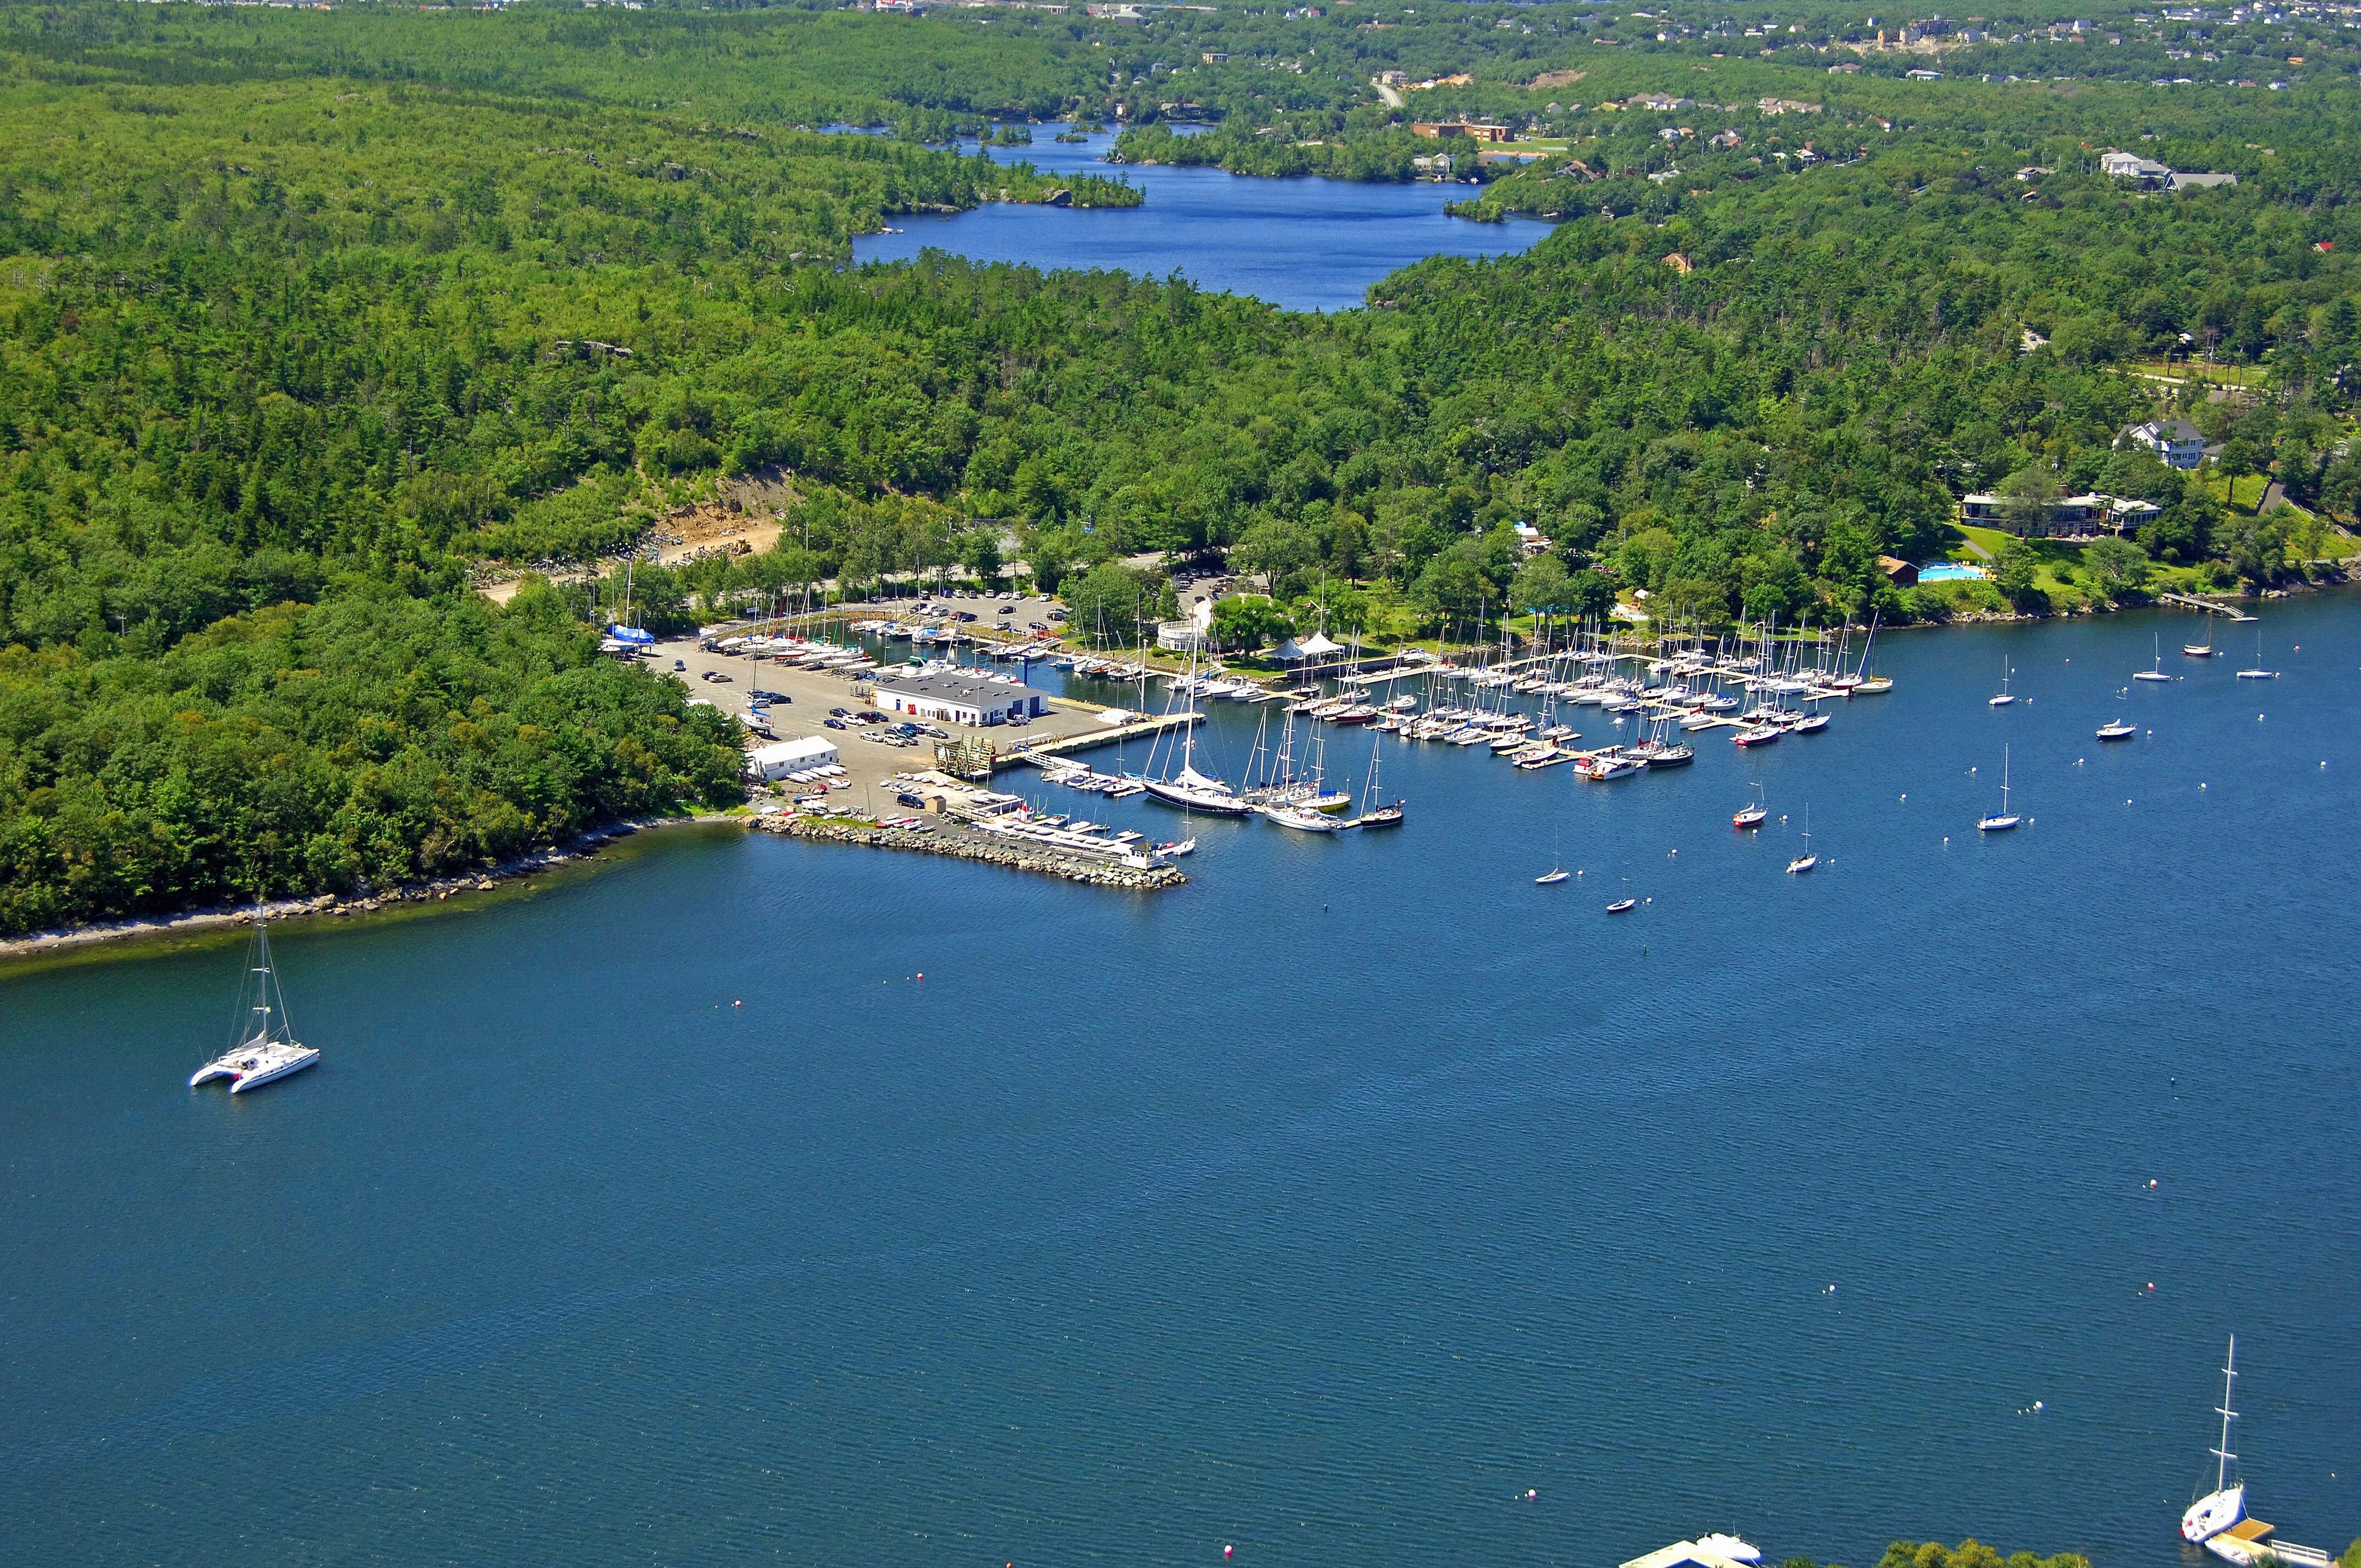 Royal Nova Scotia Yacht Squadron Marina in Halifax, NS, Canada